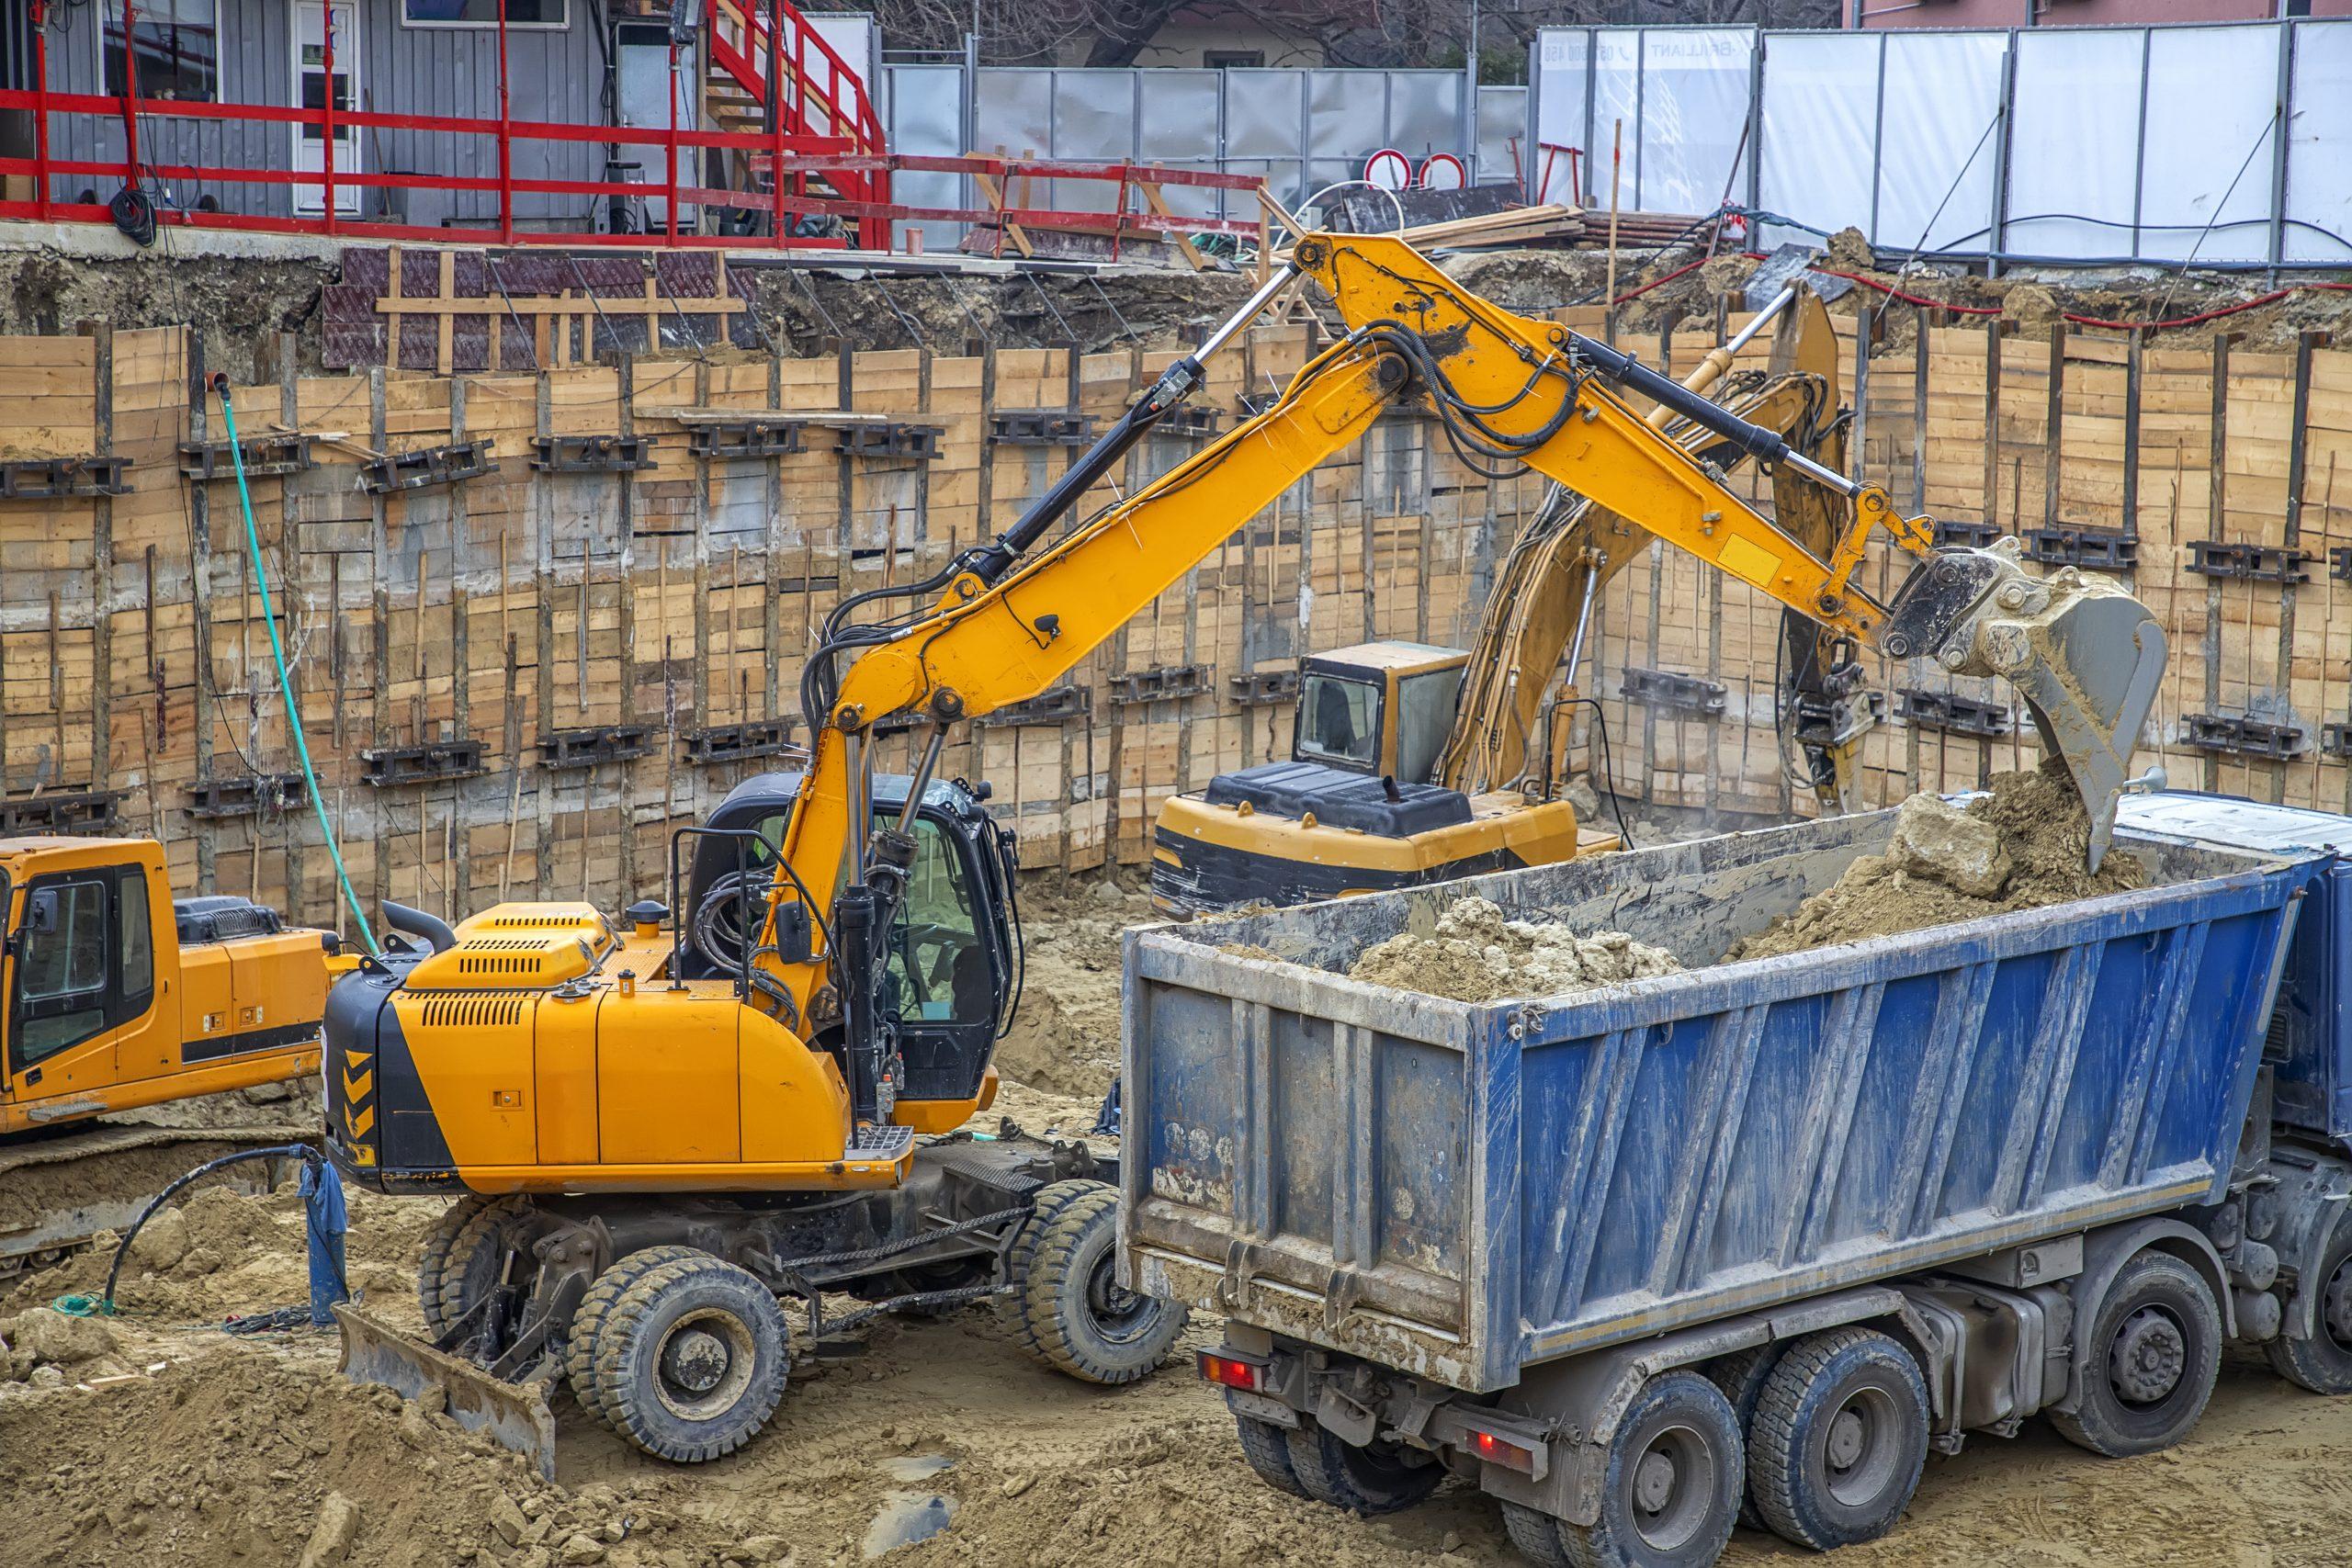 Excavator placing debris in dump truck.